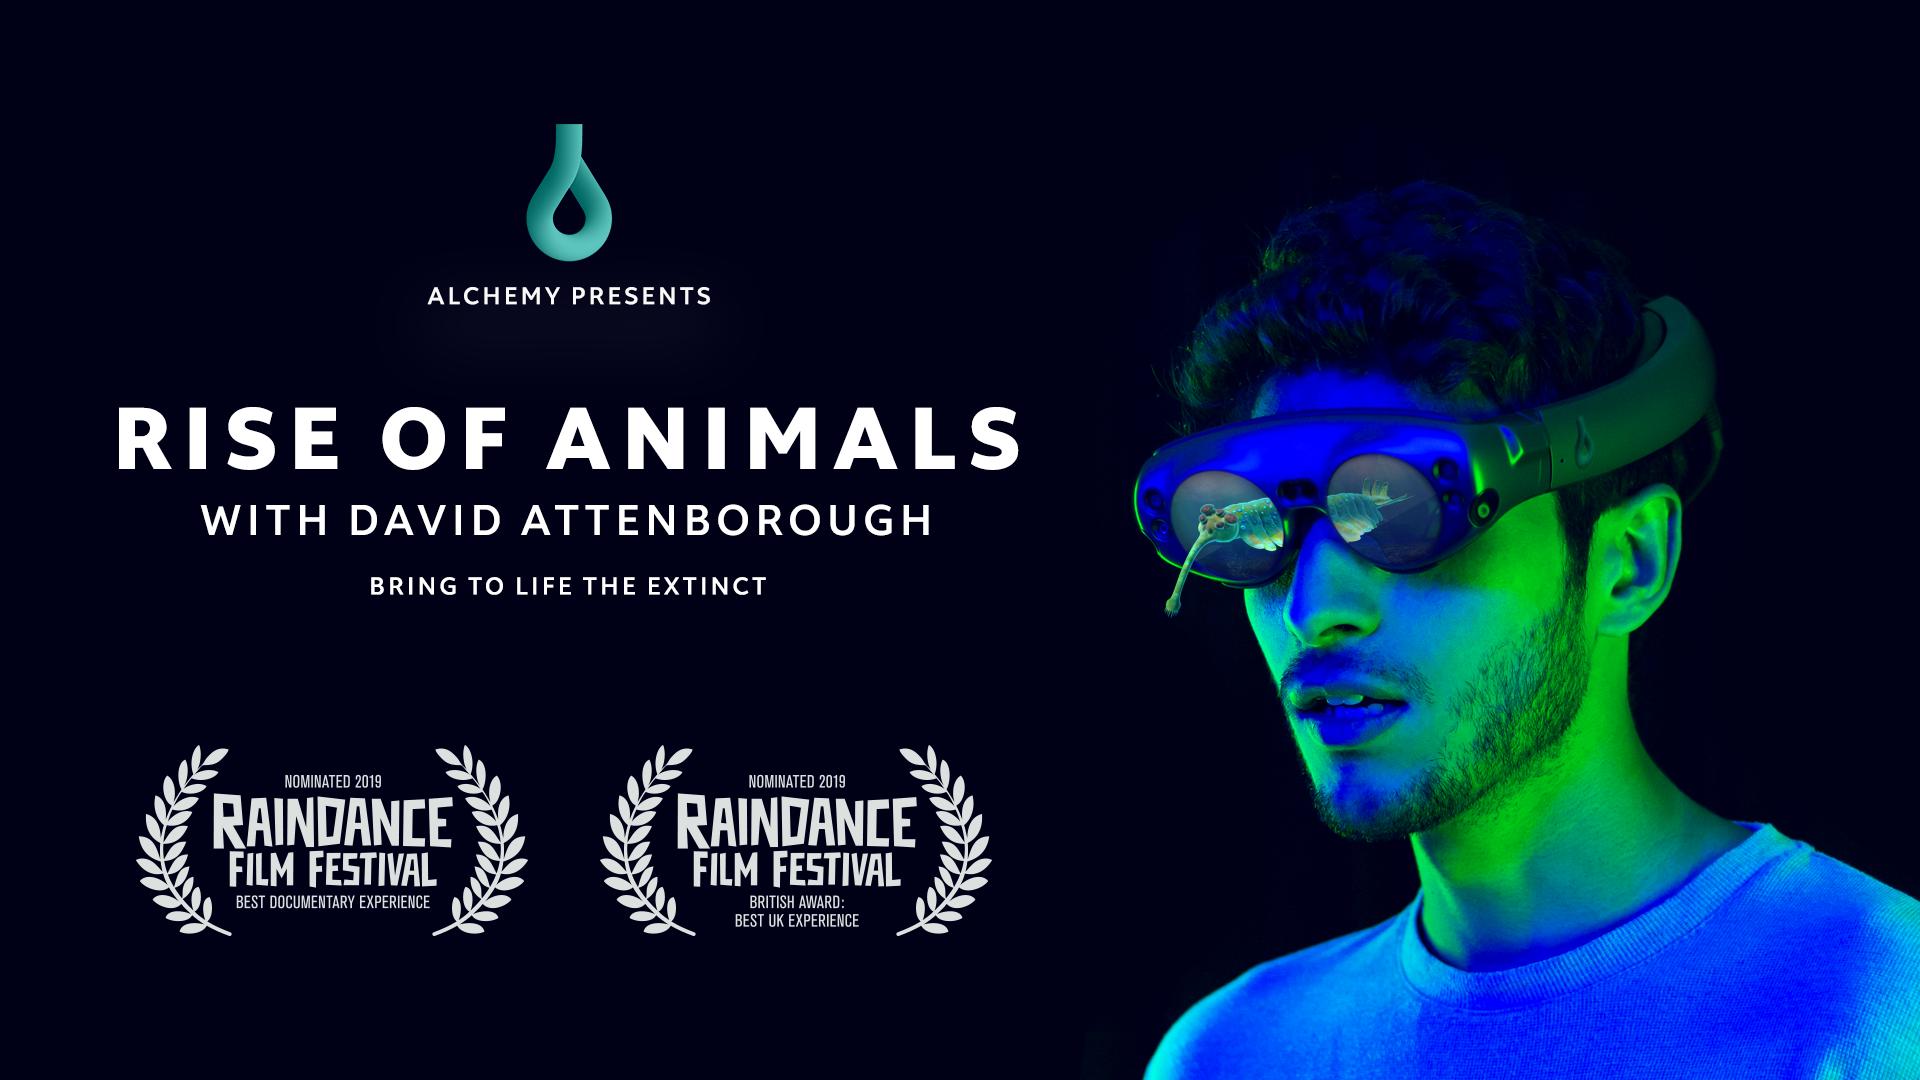 Double Nomination at Raindance Film Festival